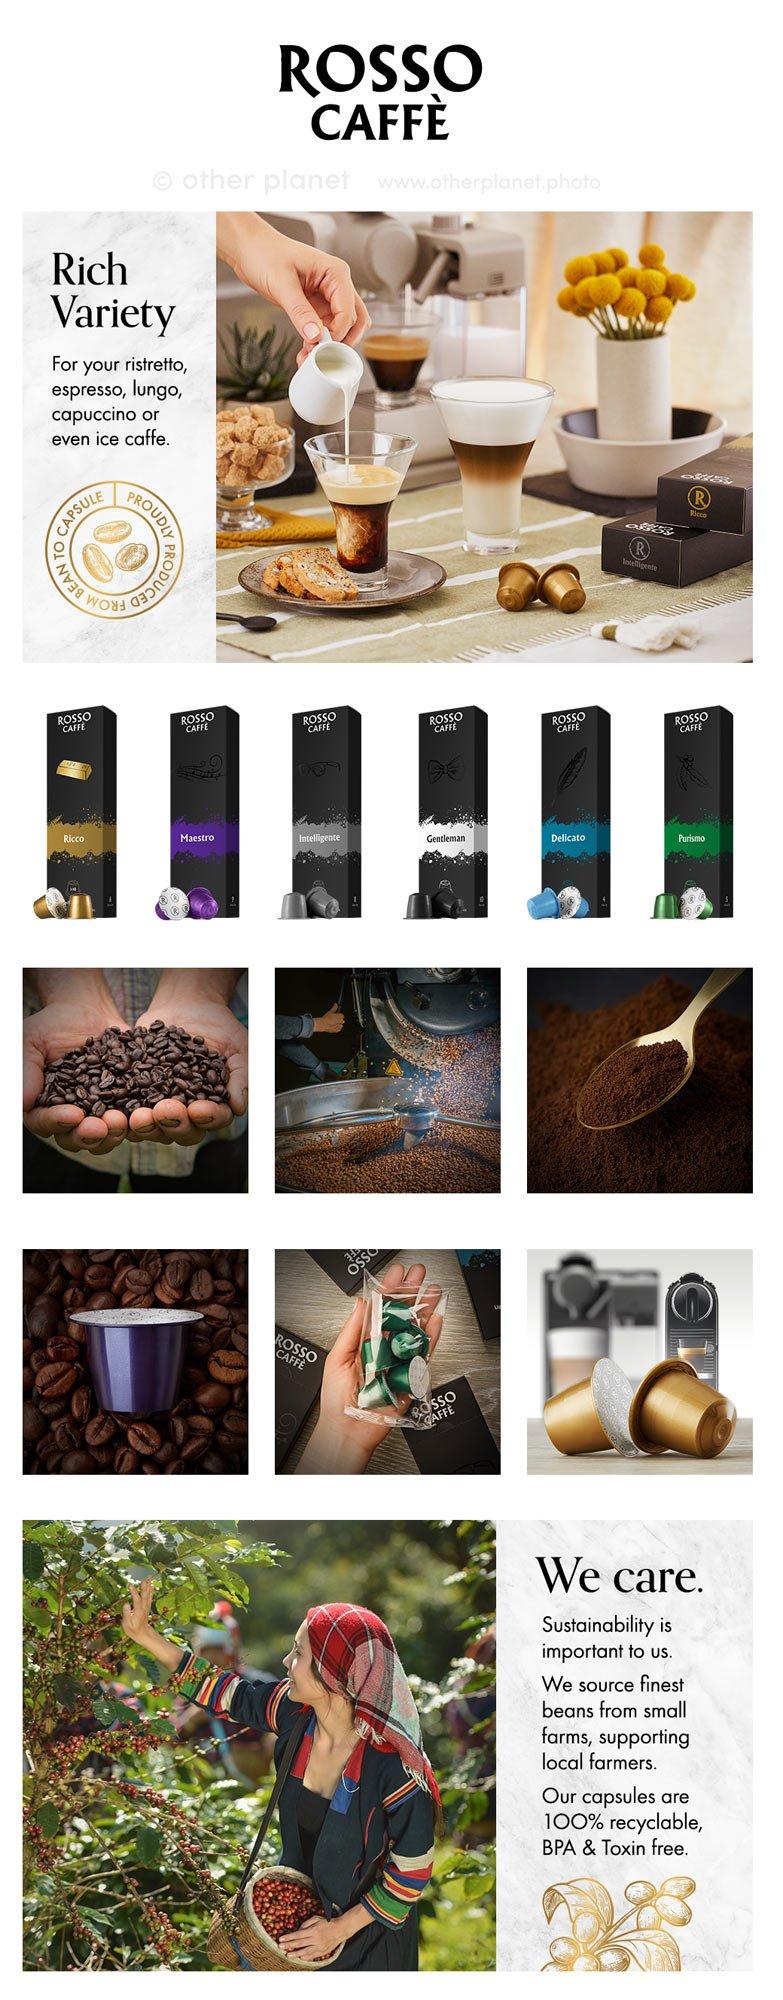 amazon product photos A+ content for espresso capsules Rosso Caffe